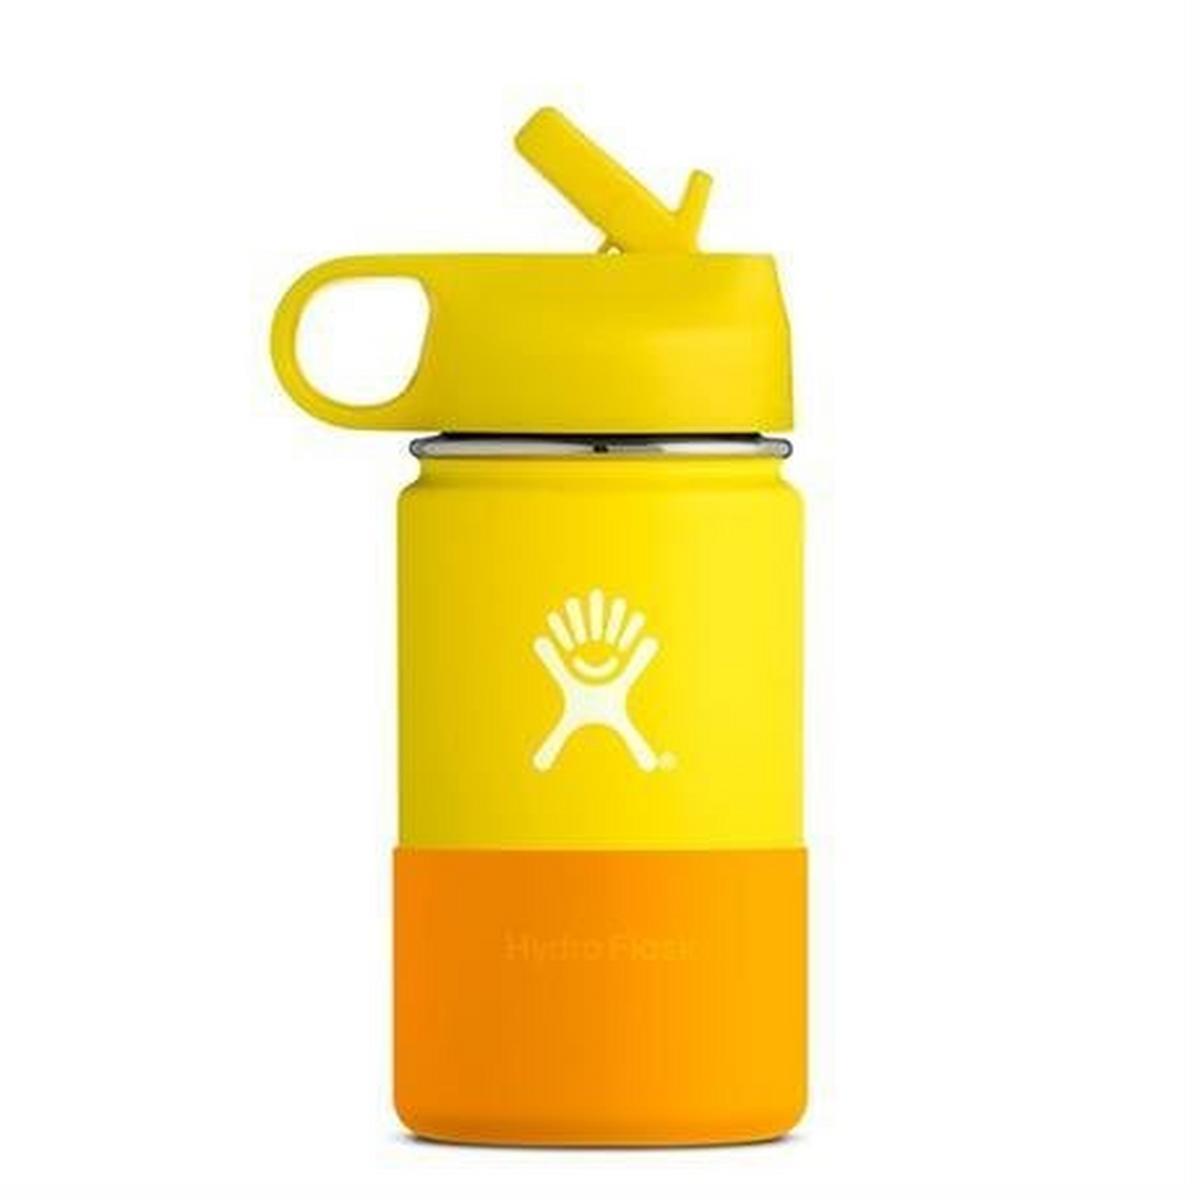 Hydro Flask CHILDREN'S Hydration 12oz / 0.35 L Wide Mouth Bottle Lemon